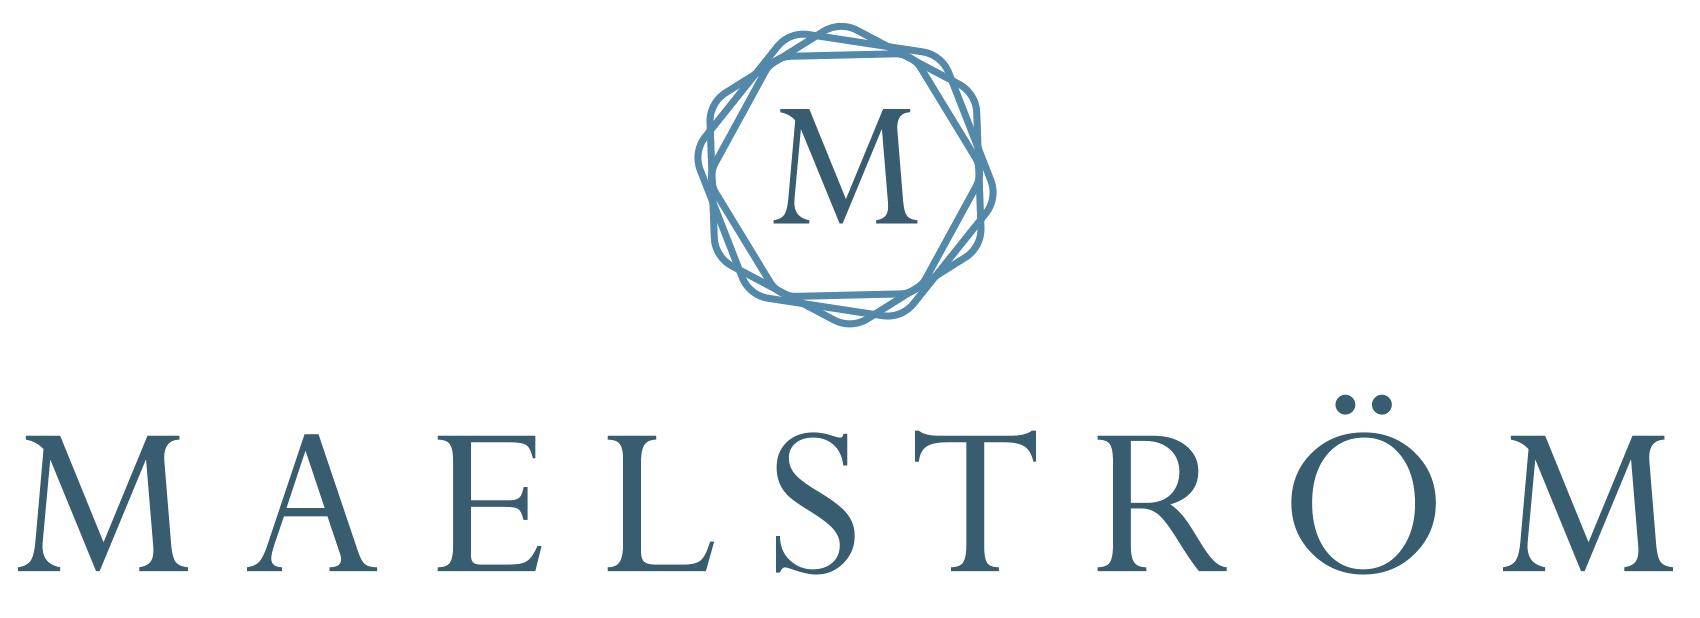 Maelstrom Winery Logo